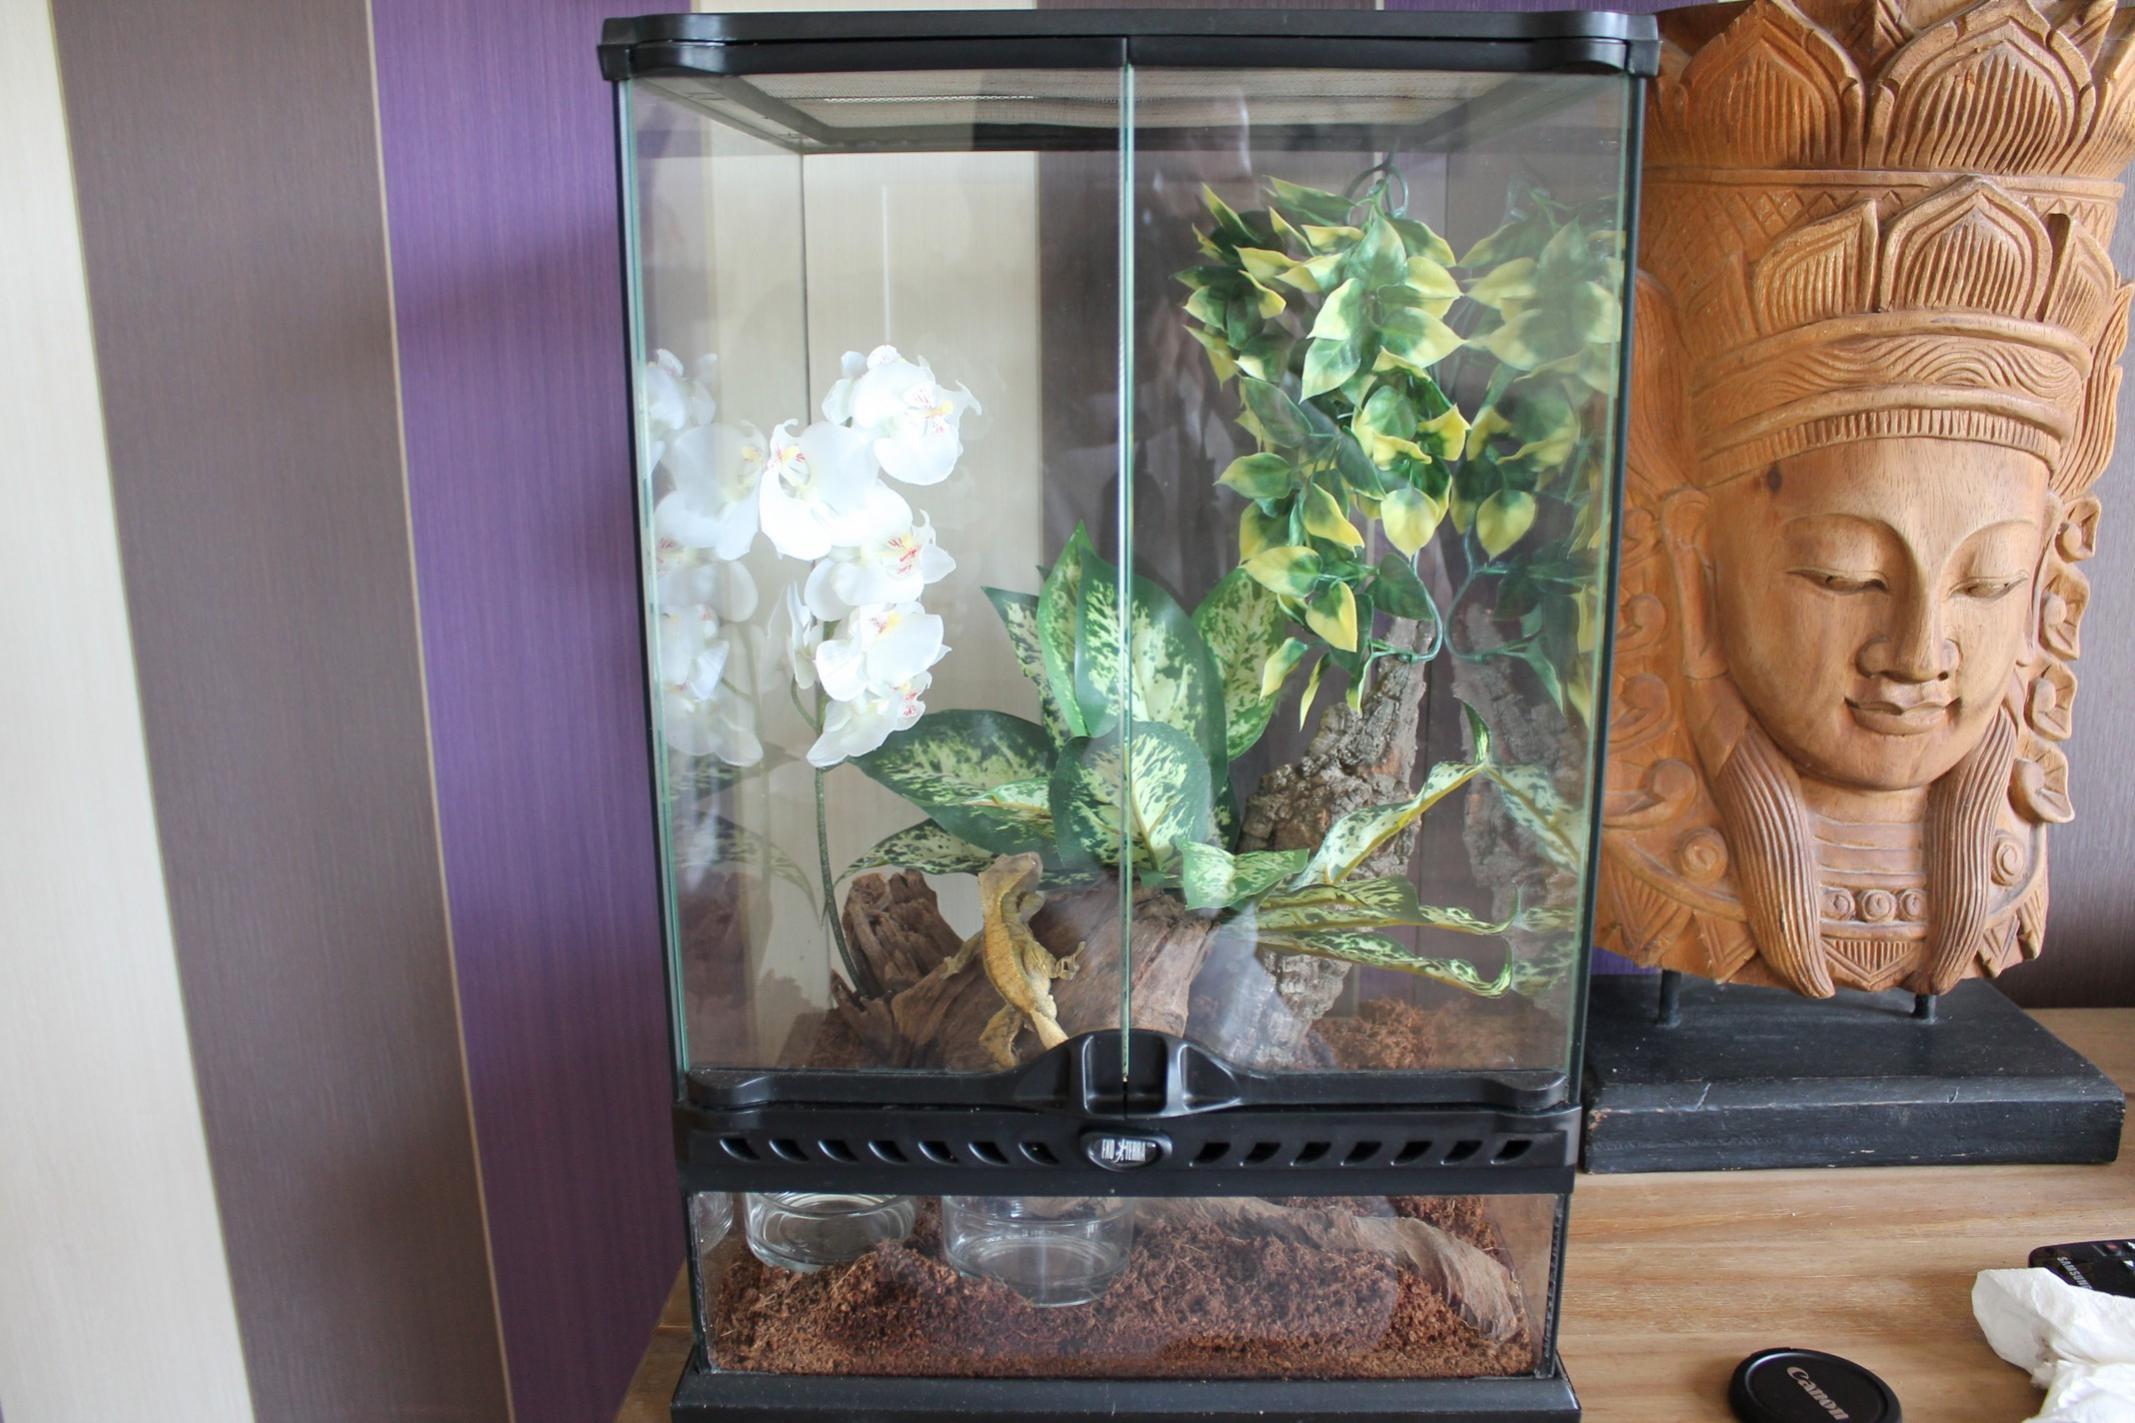 Adult cresties with seup & Baby cresties-setup-1a.jpg